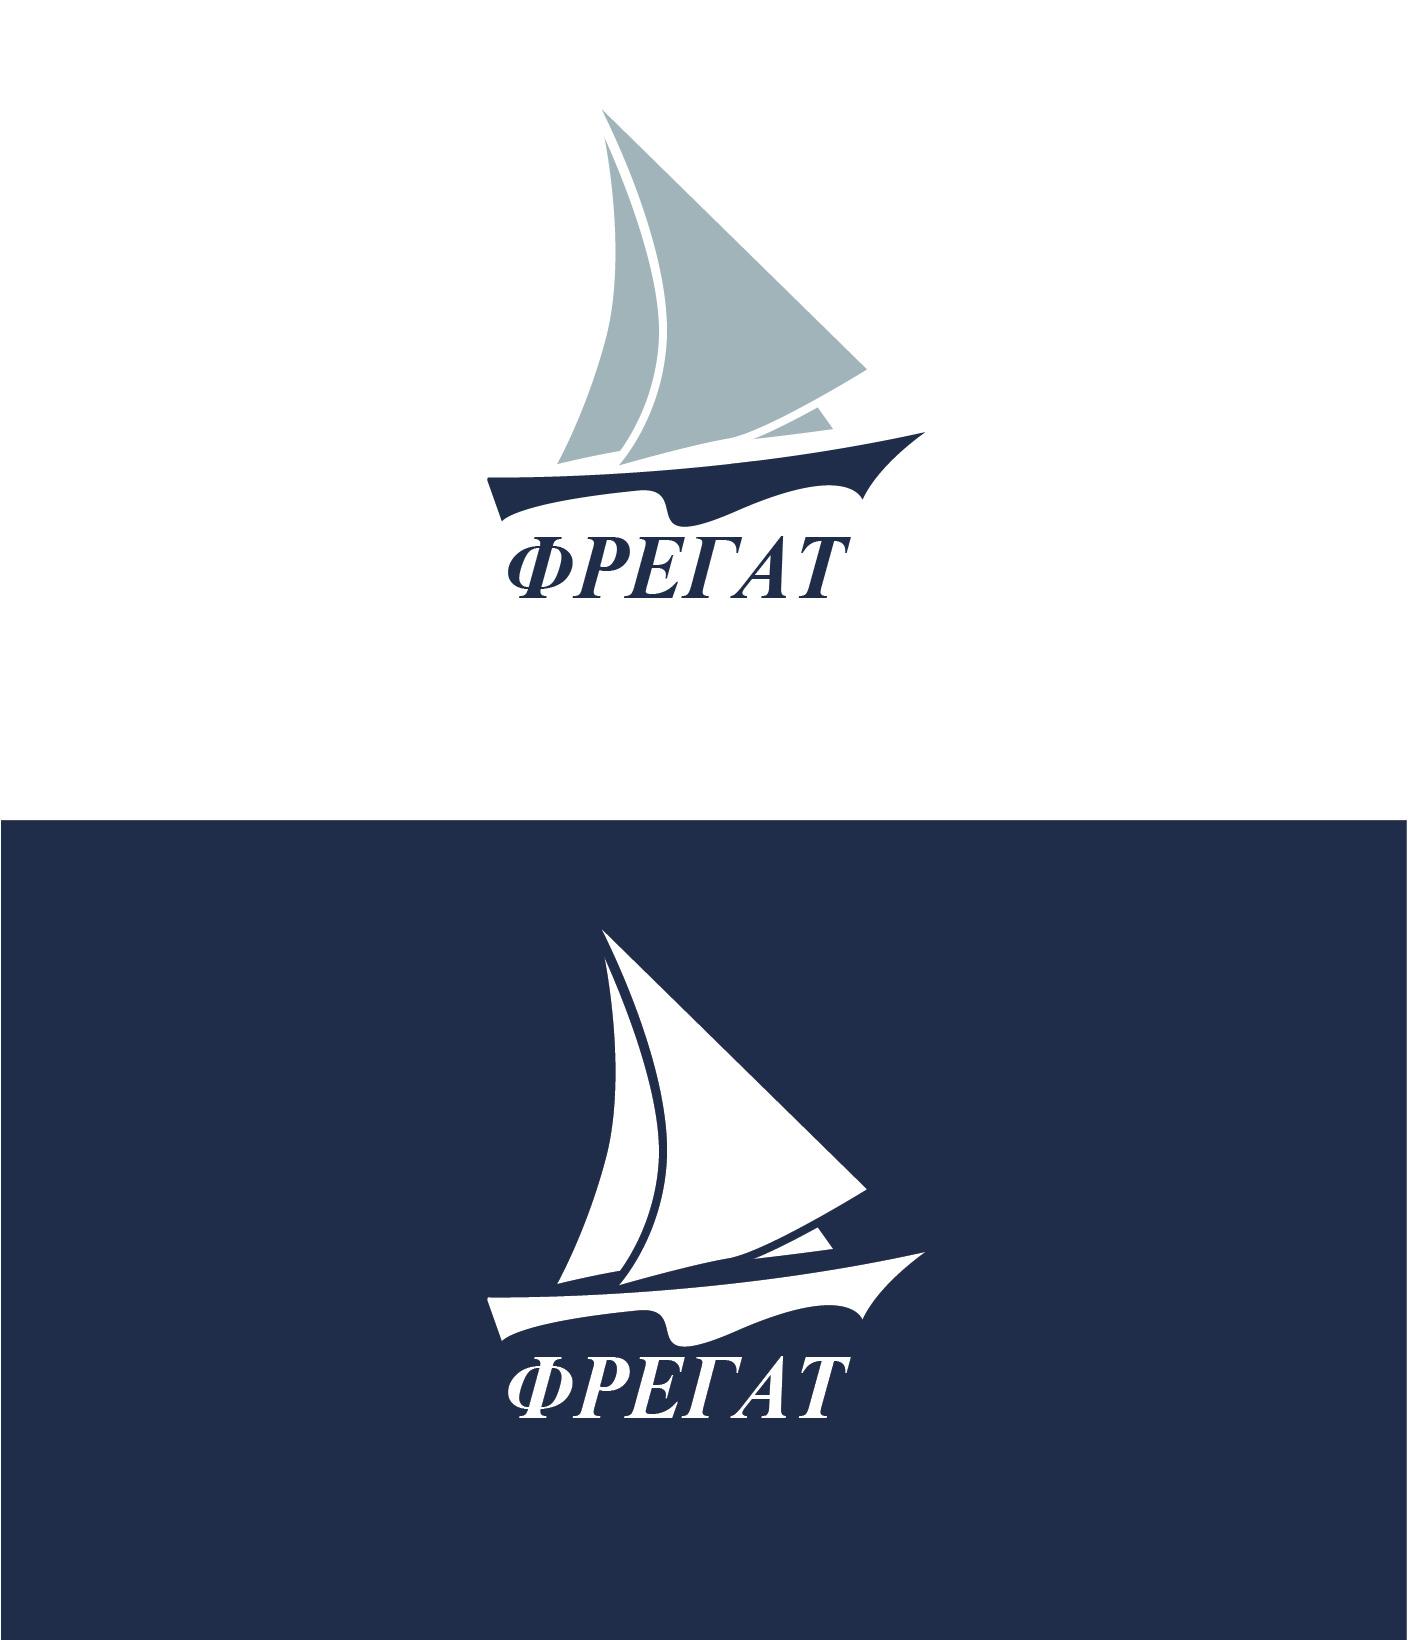 "Логотип, фирменный стиль Ломбард ""Фрегат"" фото f_6175bc41996eb2de.jpg"